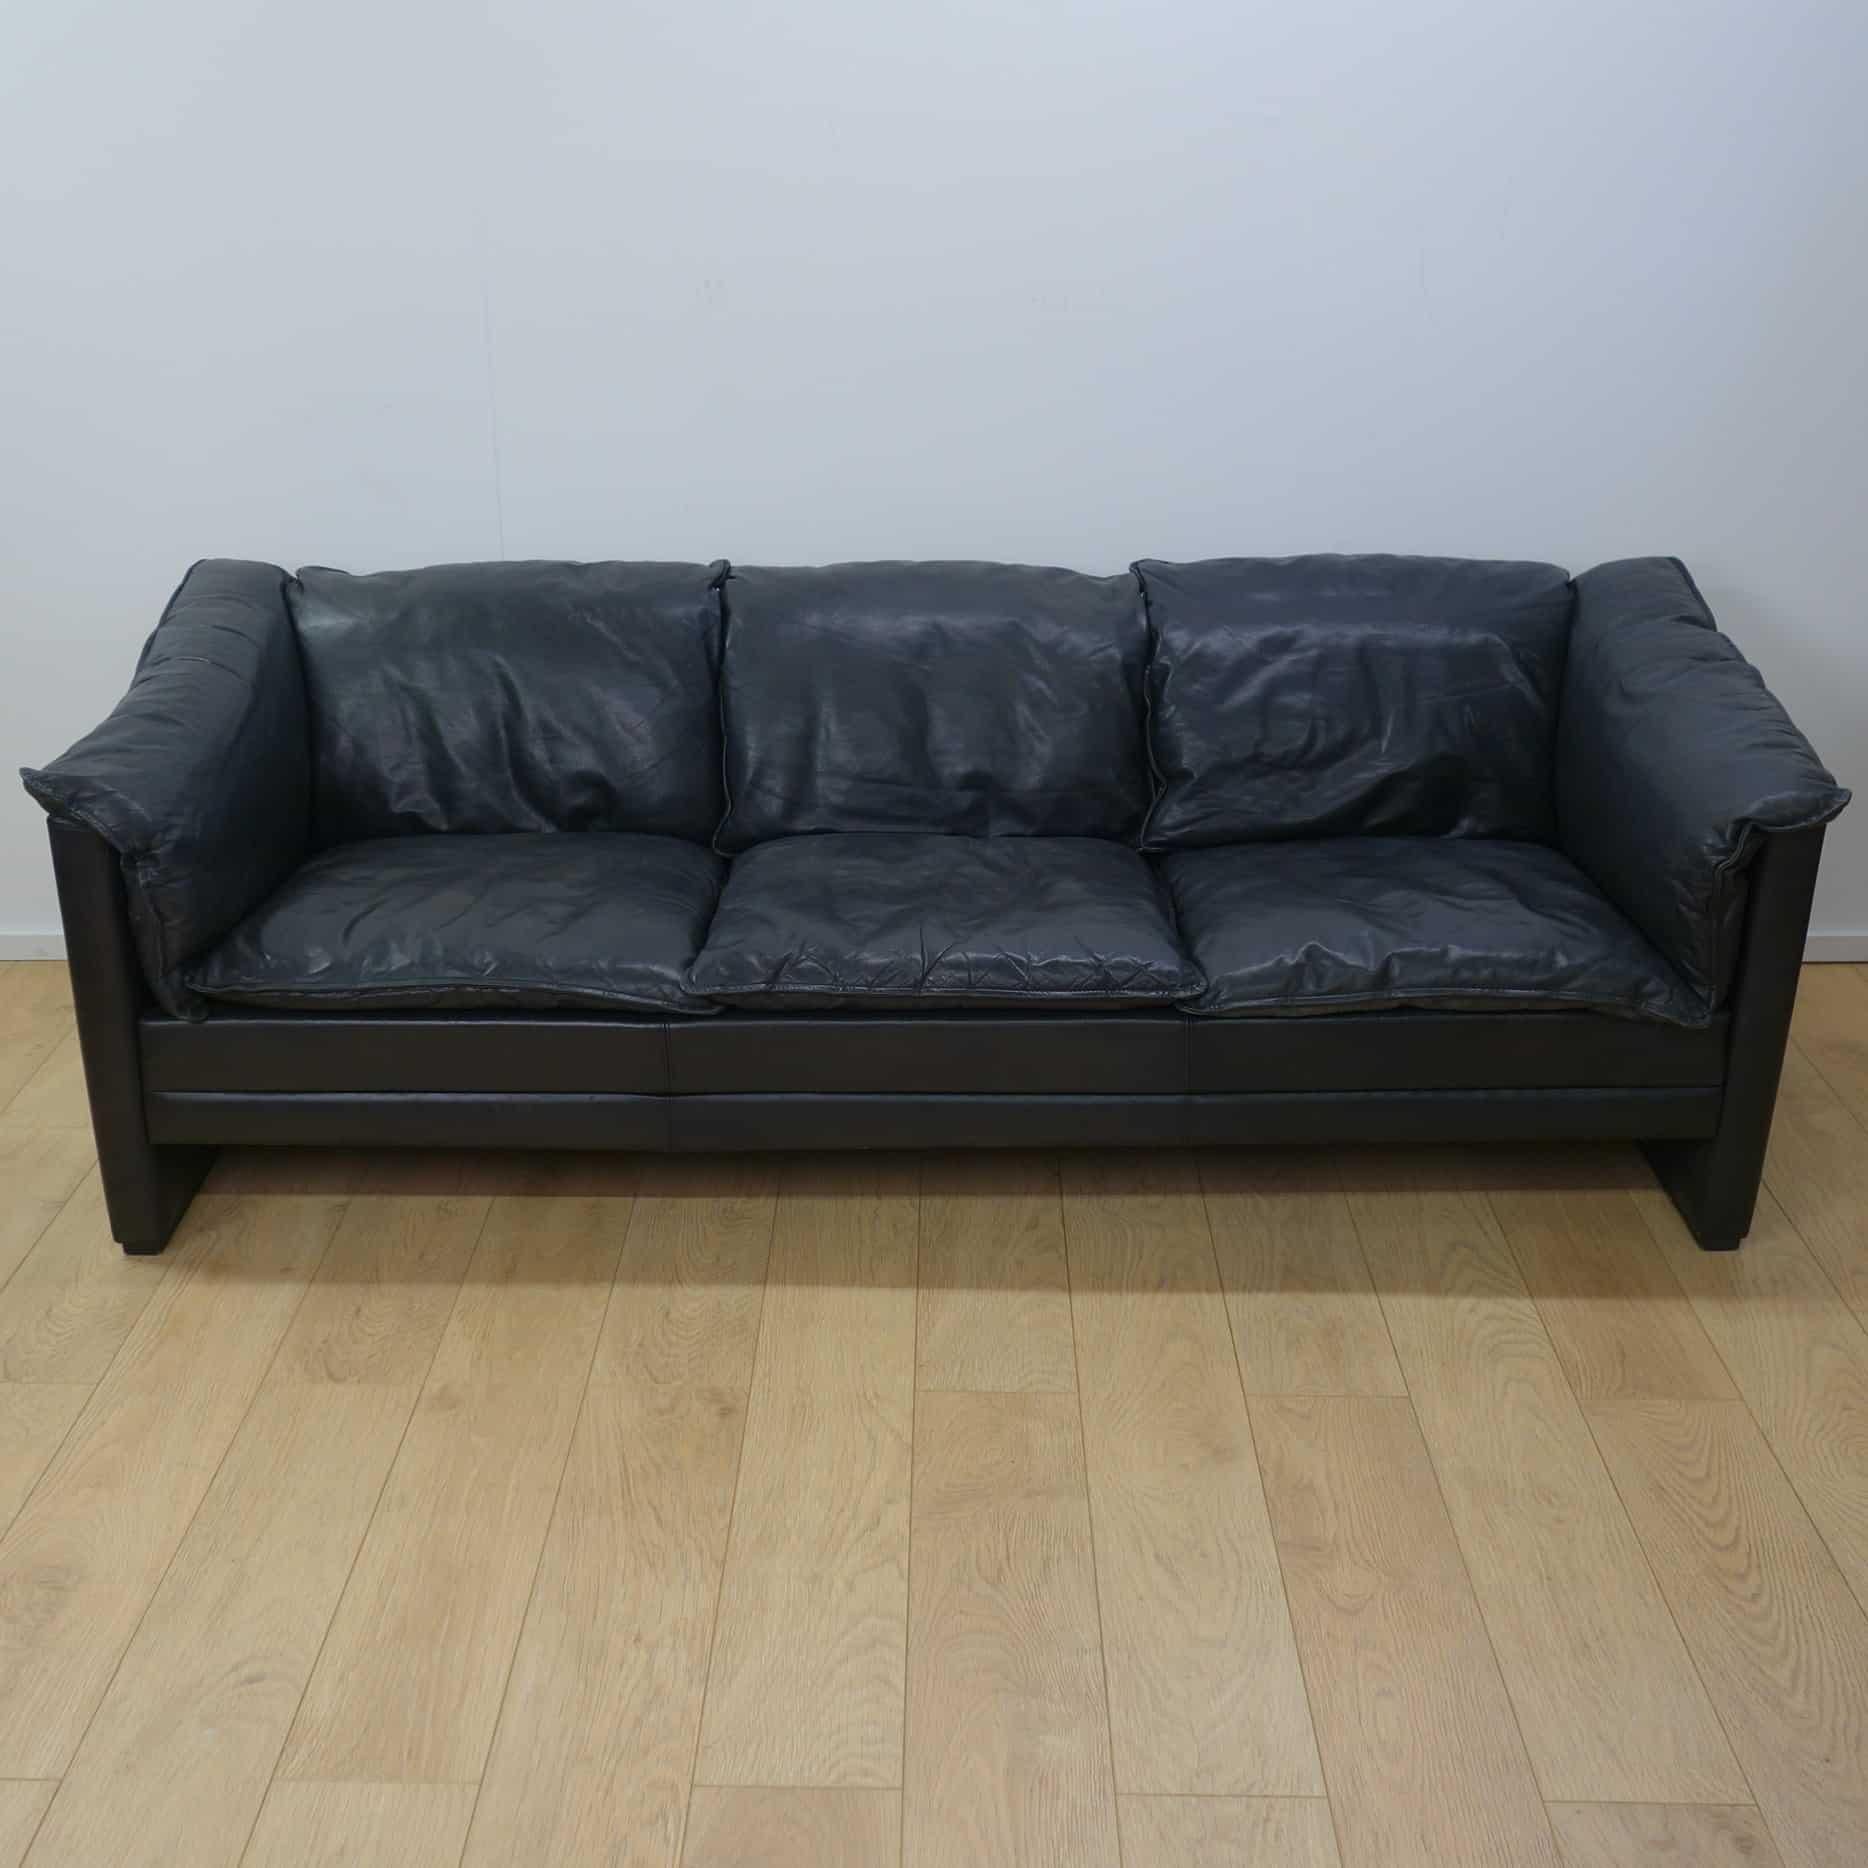 3 seater black leather sofa day sofas danish mark parrish mid